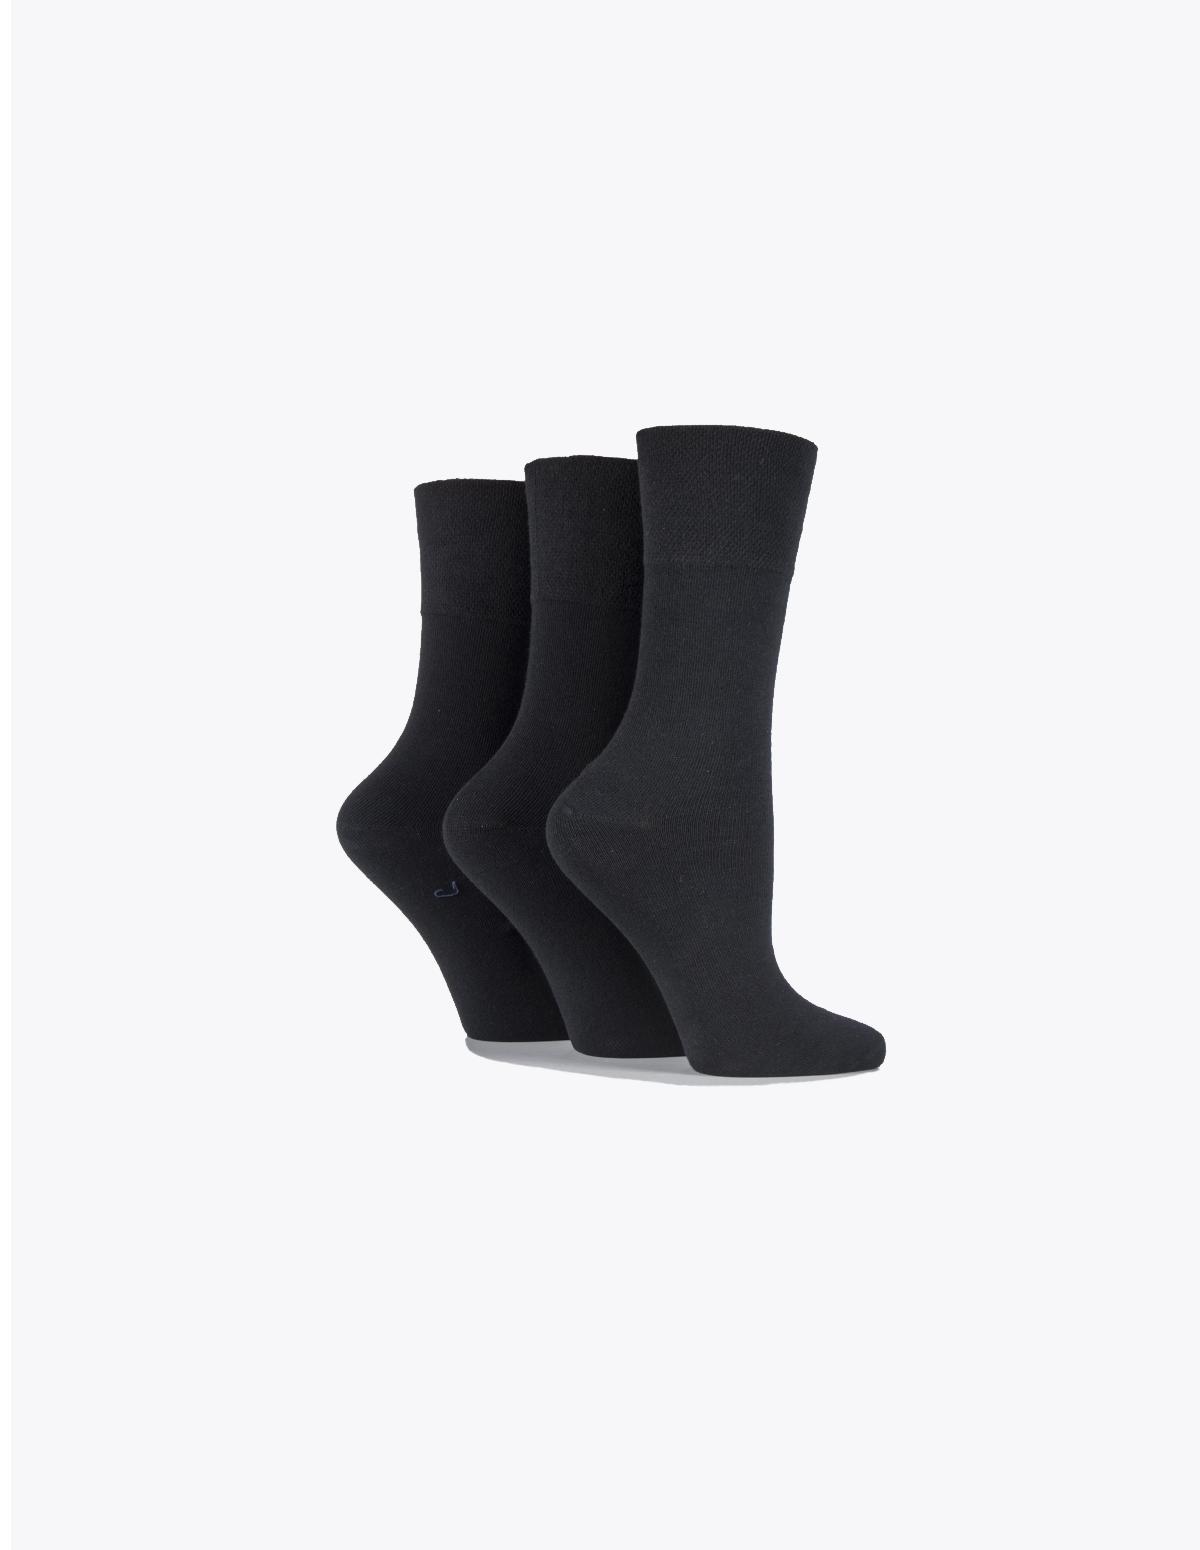 8c75b85b4 Ladies Plain Black Gentle Grip socks (Non Elastic